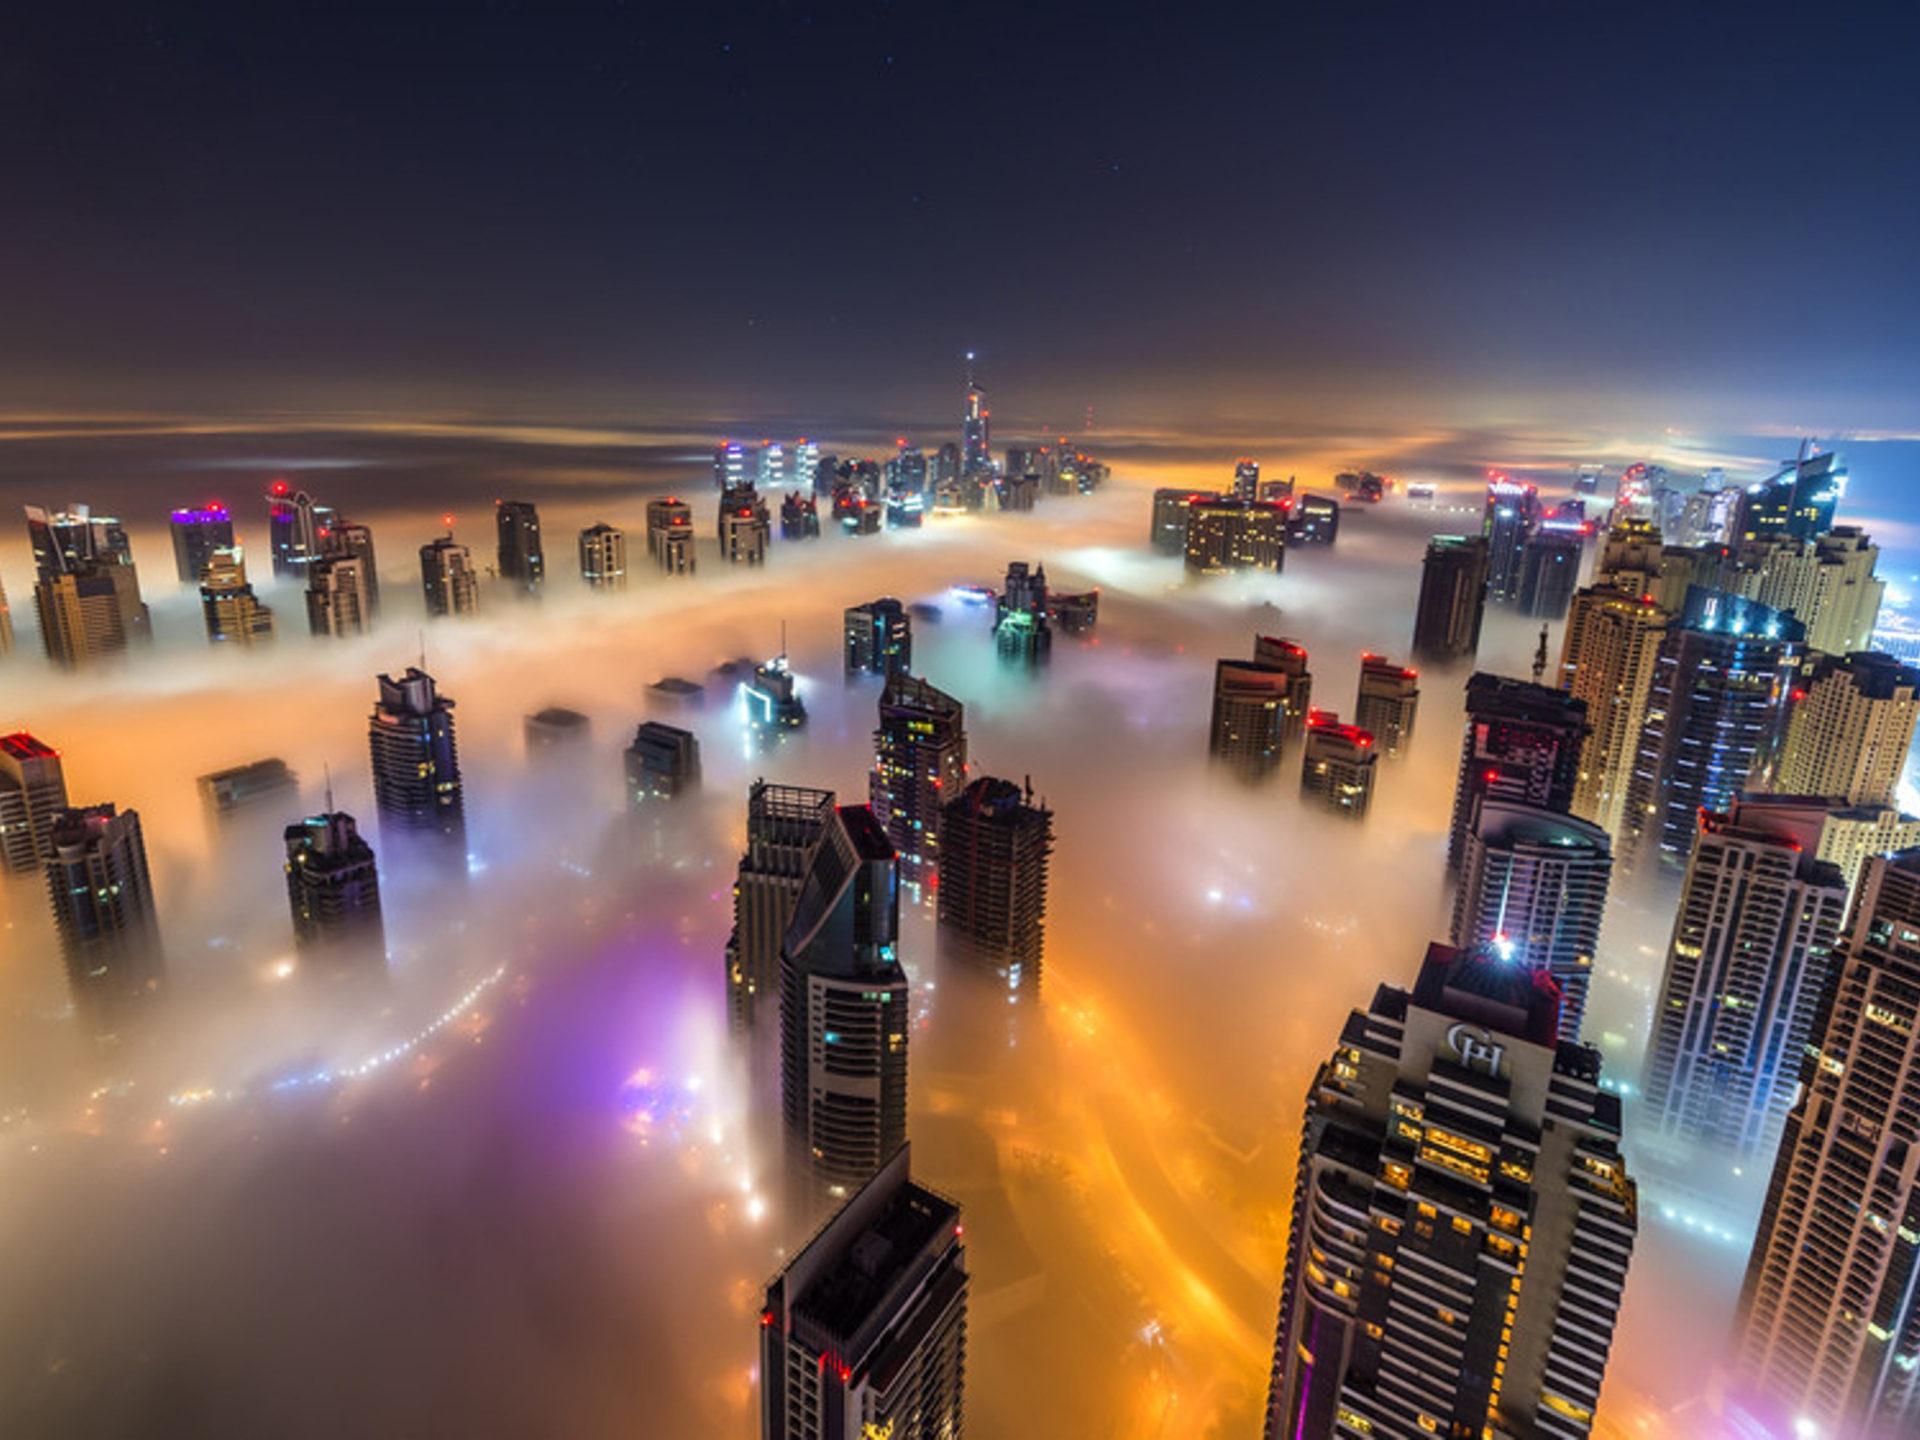 Rio De Janeiro Wallpaper Iphone Dubai Night Time City In The Fog Hd Wallpaper